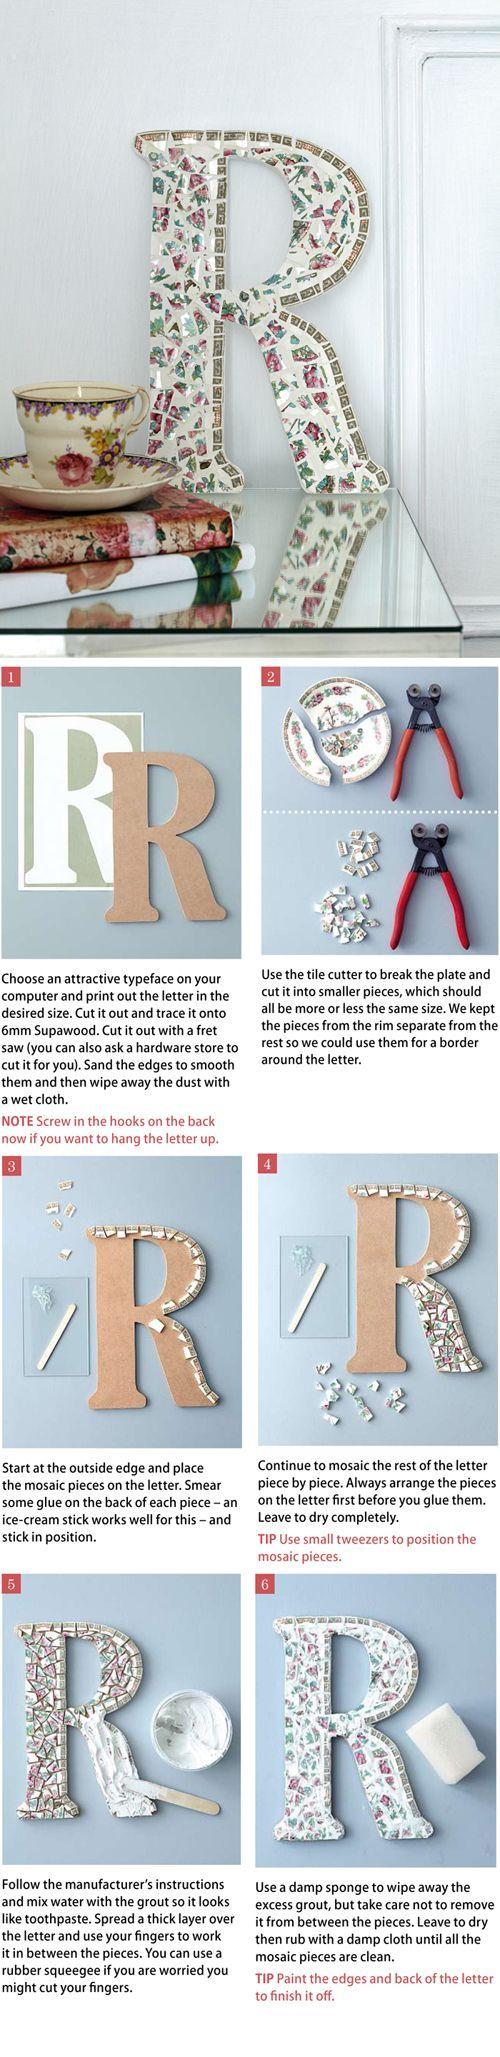 25 best ideas about broken mirror art on pinterest for Broken mirror craft ideas